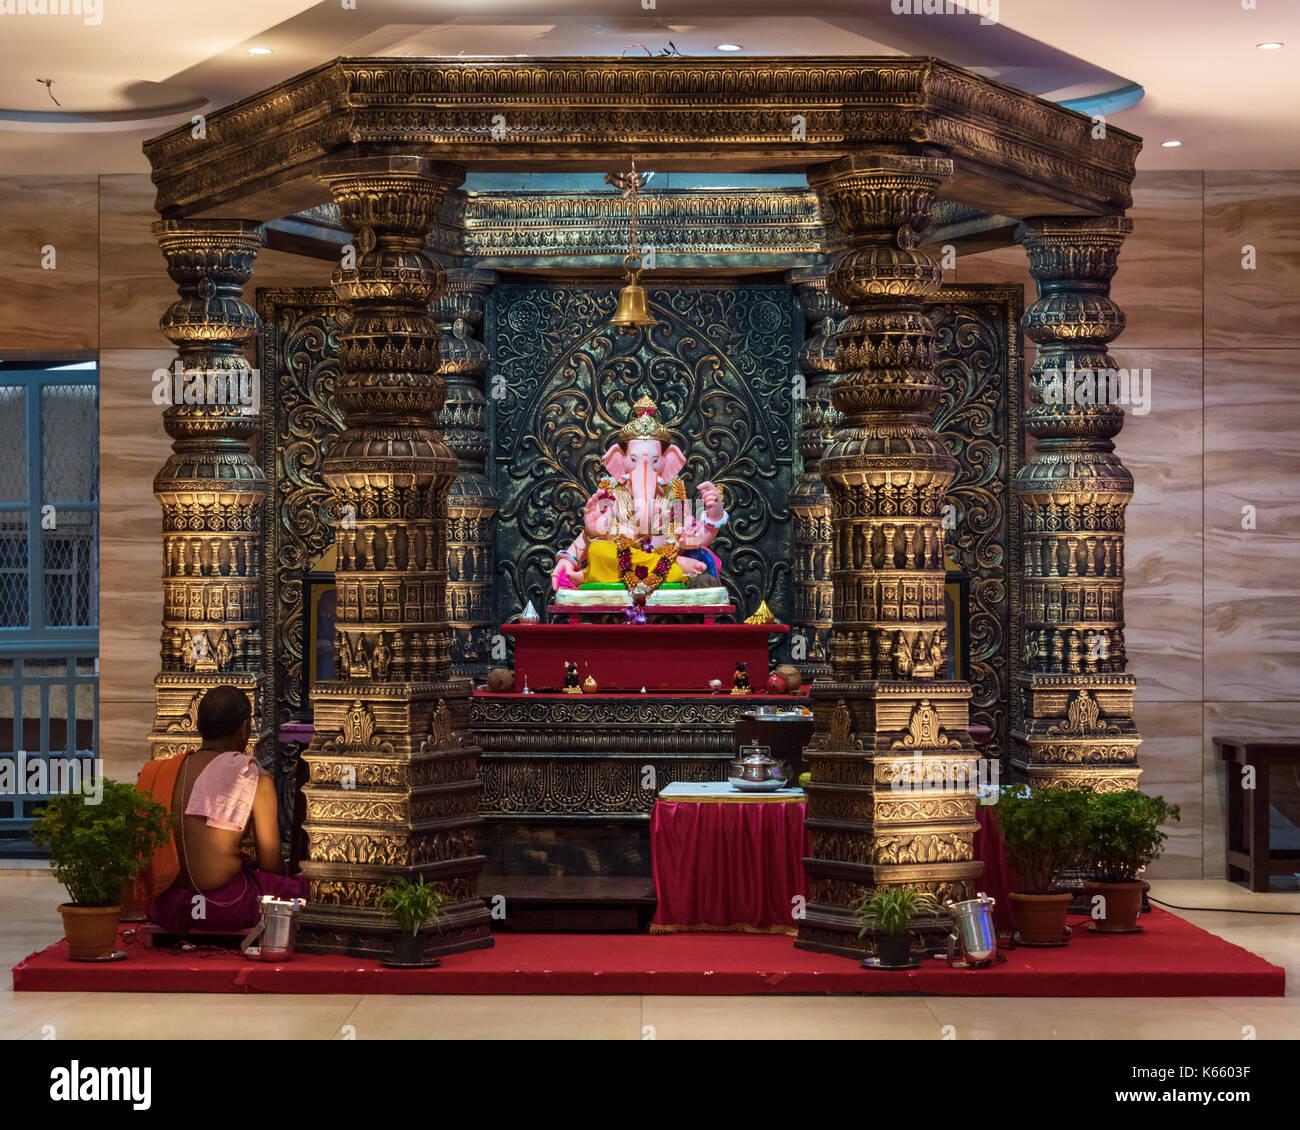 Le brahmane Sabha, Ganesh Festival 2017, Mumbai, Inde Photo Stock